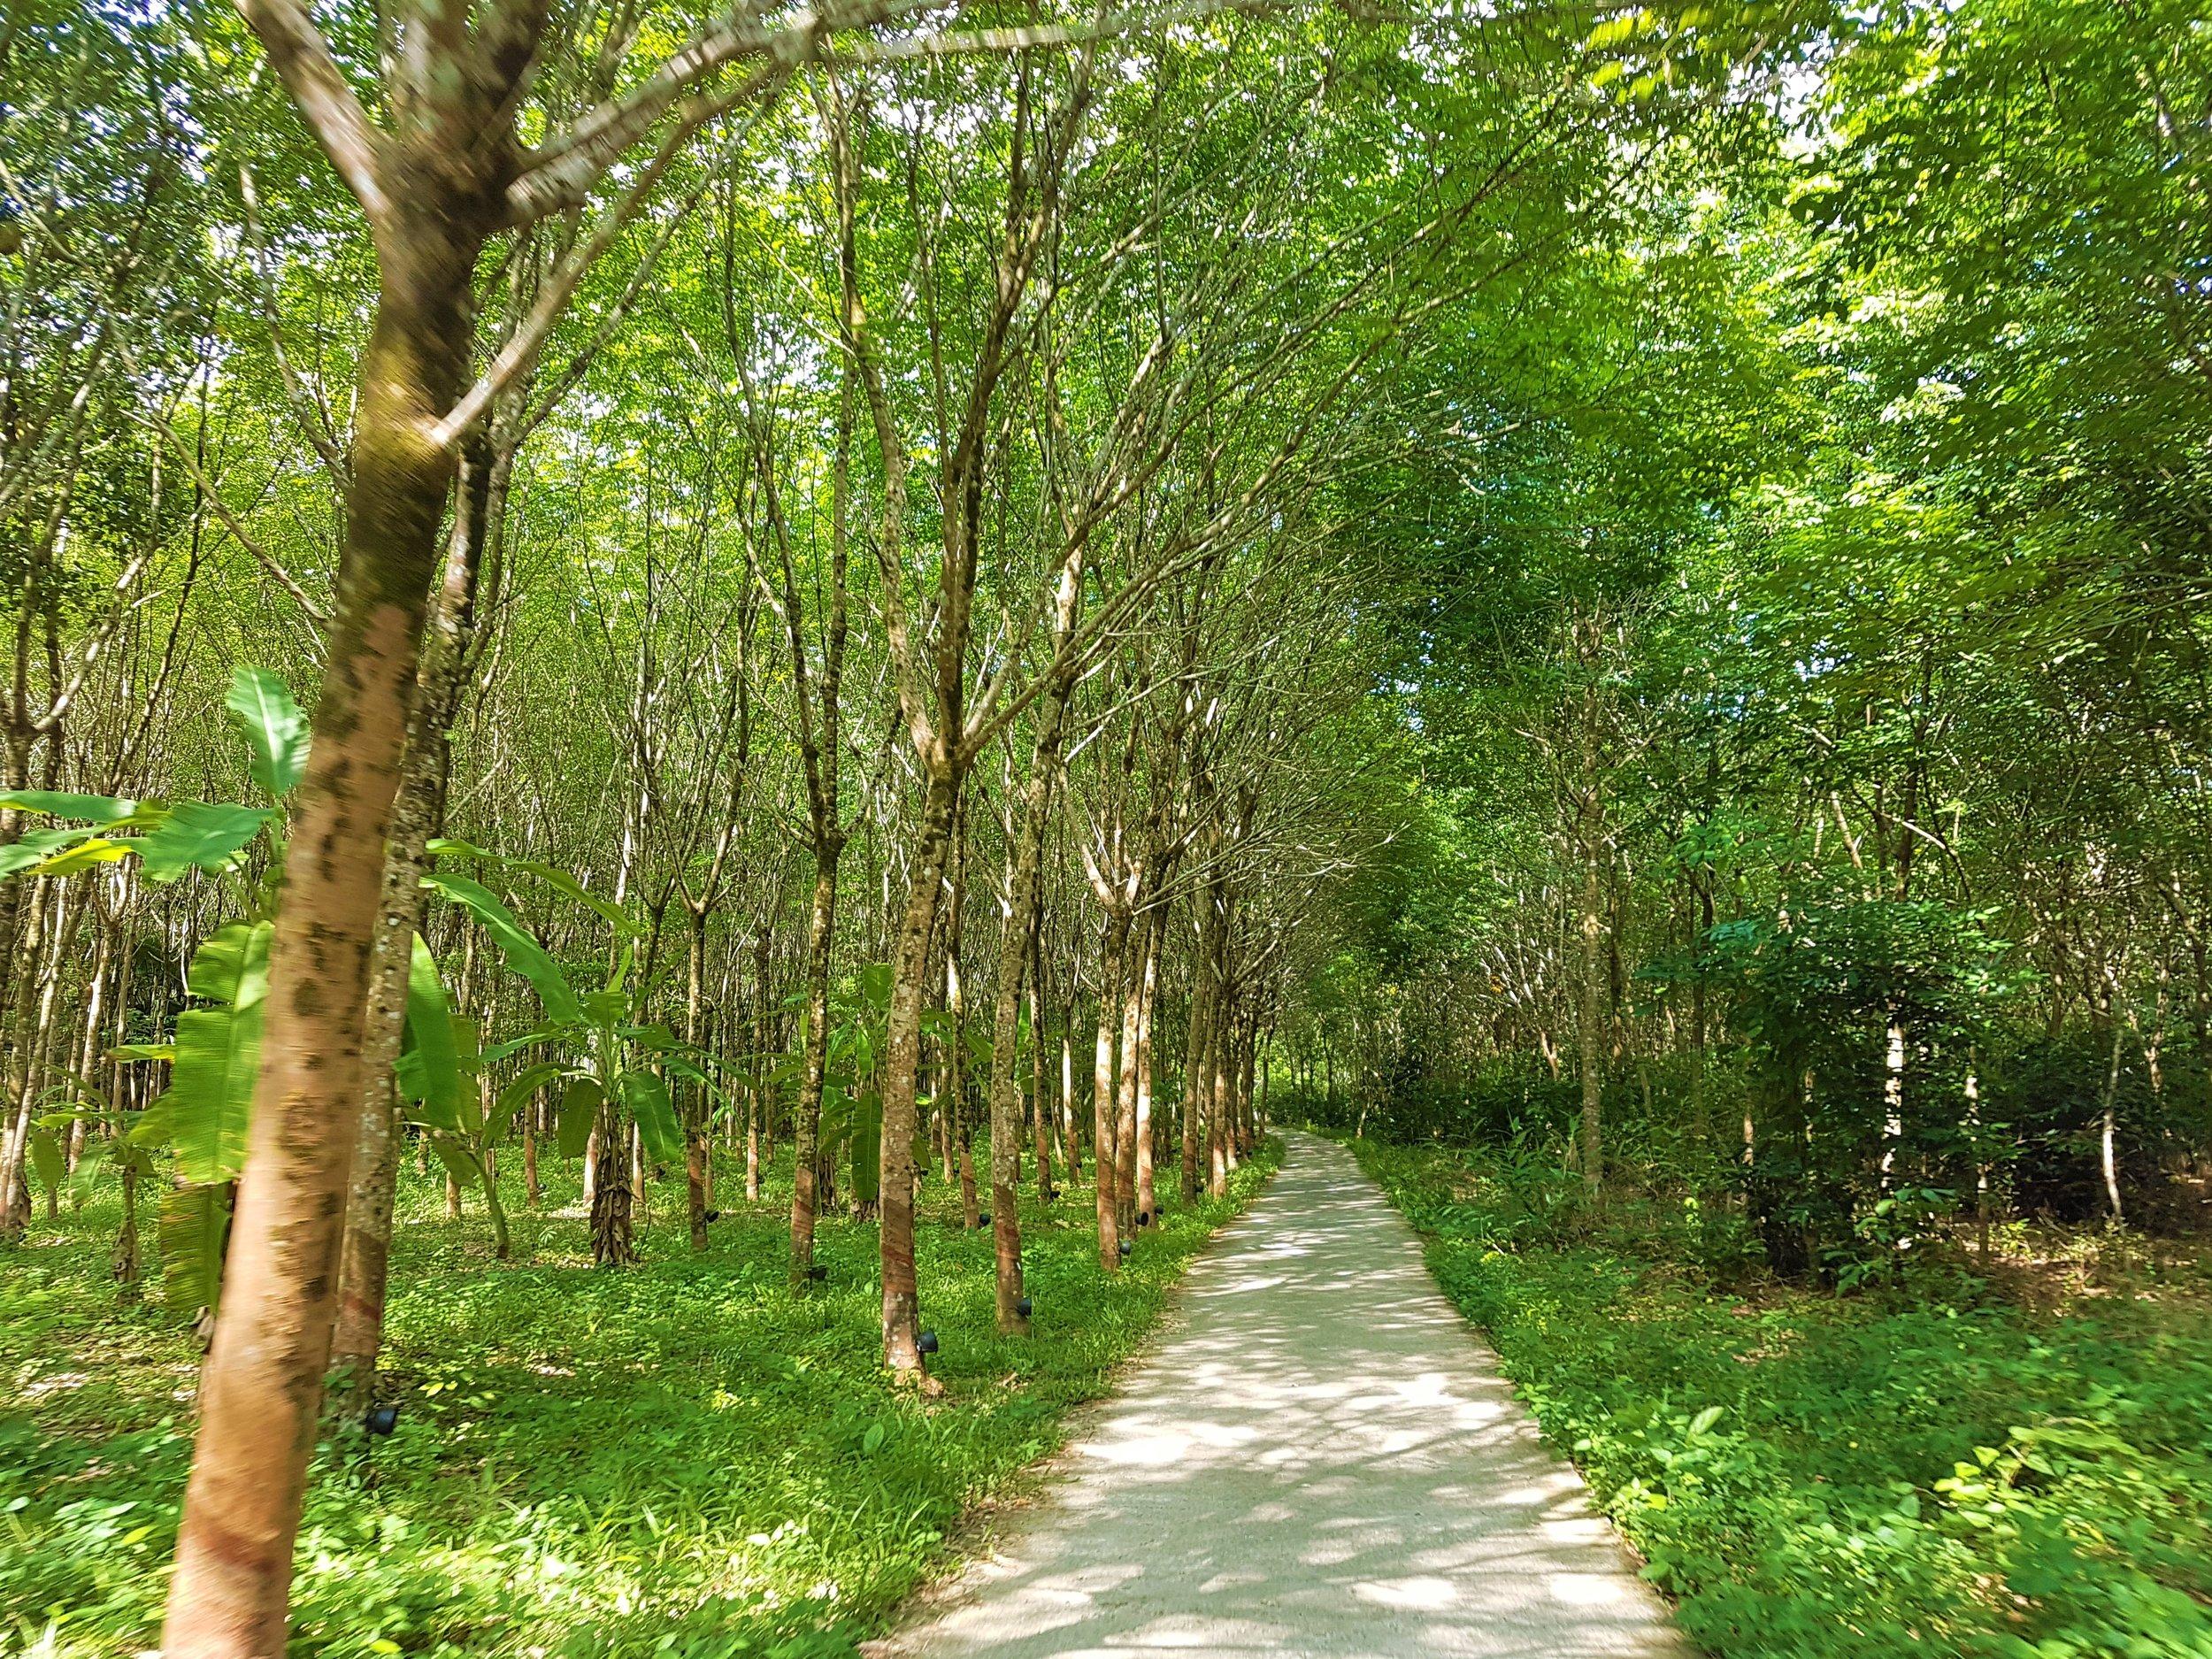 Verdant rubber trees.